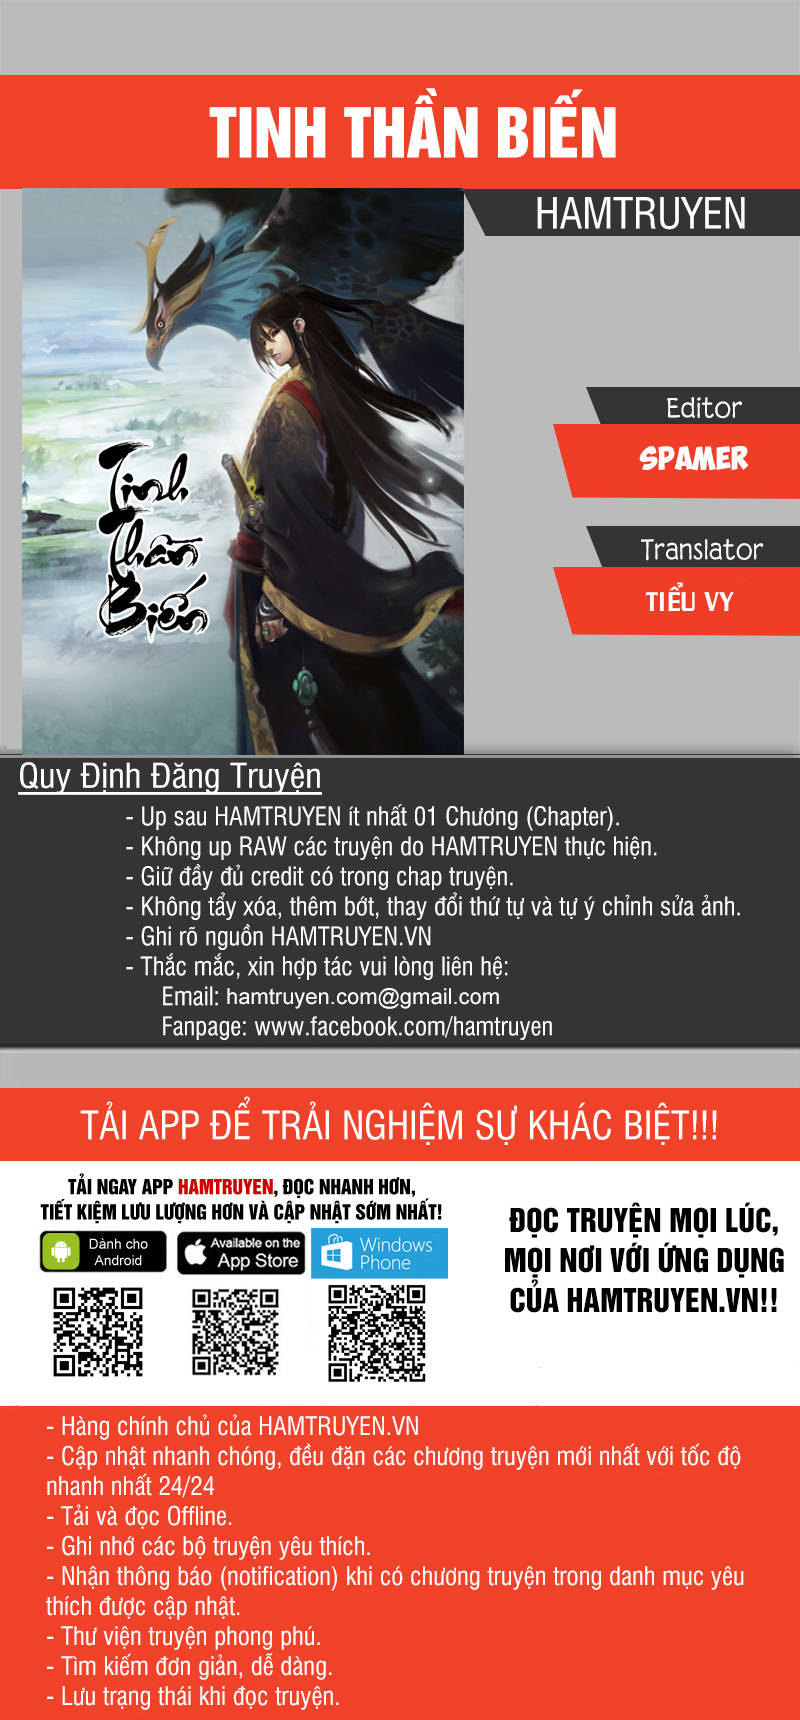 Tinh Thần Biến Chapter 444 - Upload bởi truyensieuhay.com